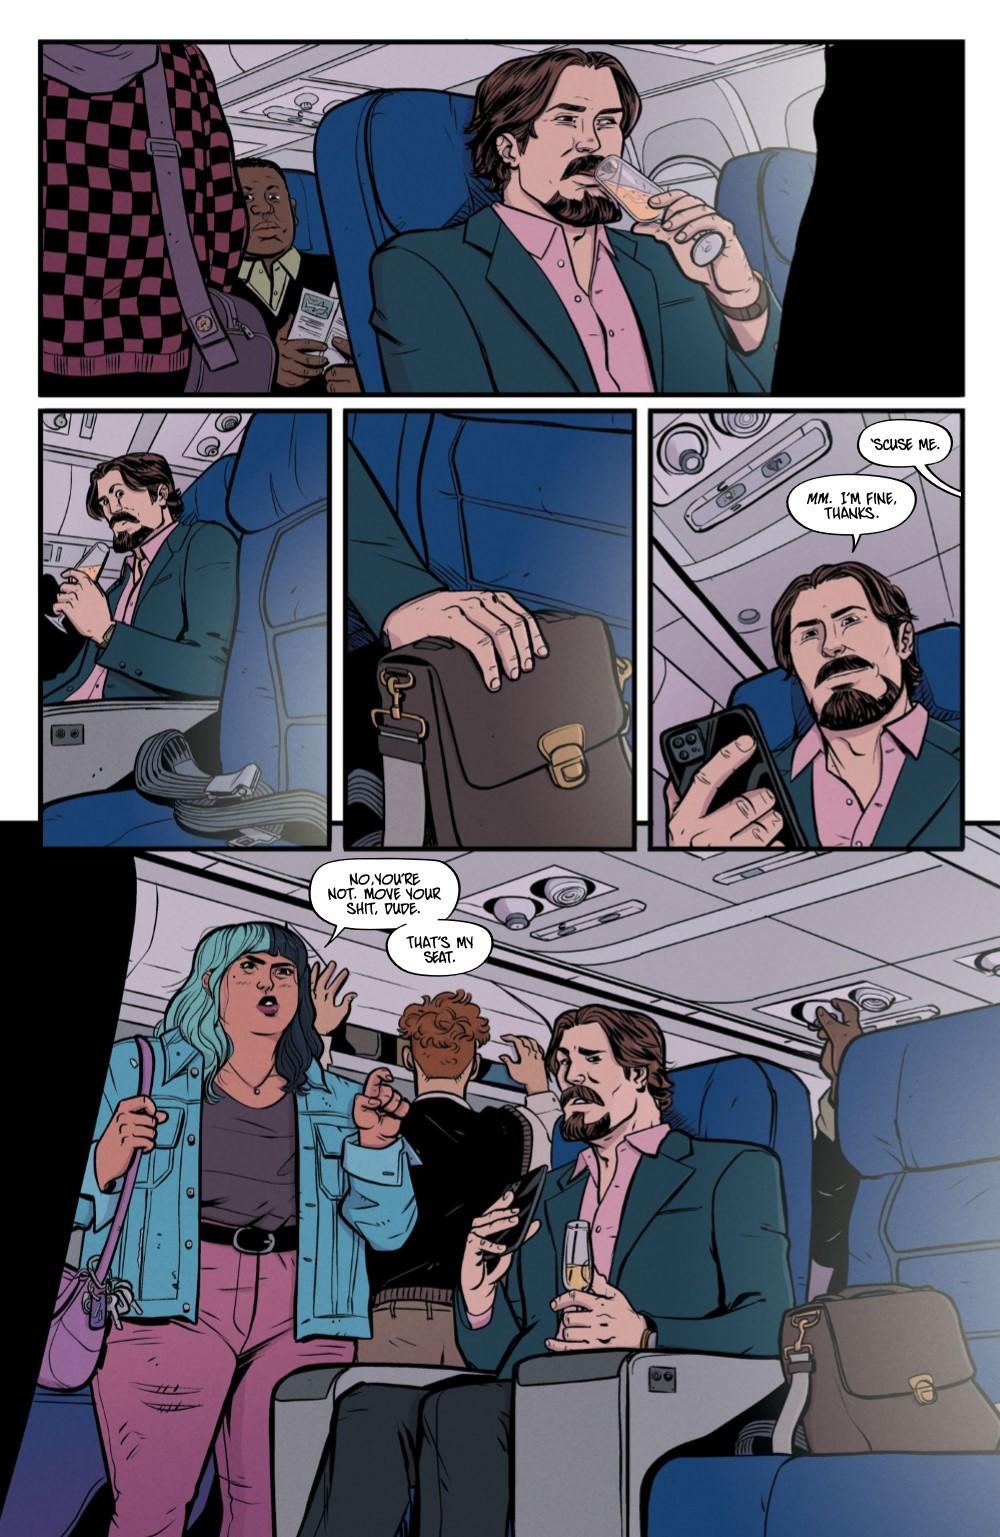 DIRTBAGRAPTURE1-MARKETING-02 ComicList Previews: DIRTBAG RAPTURE #1